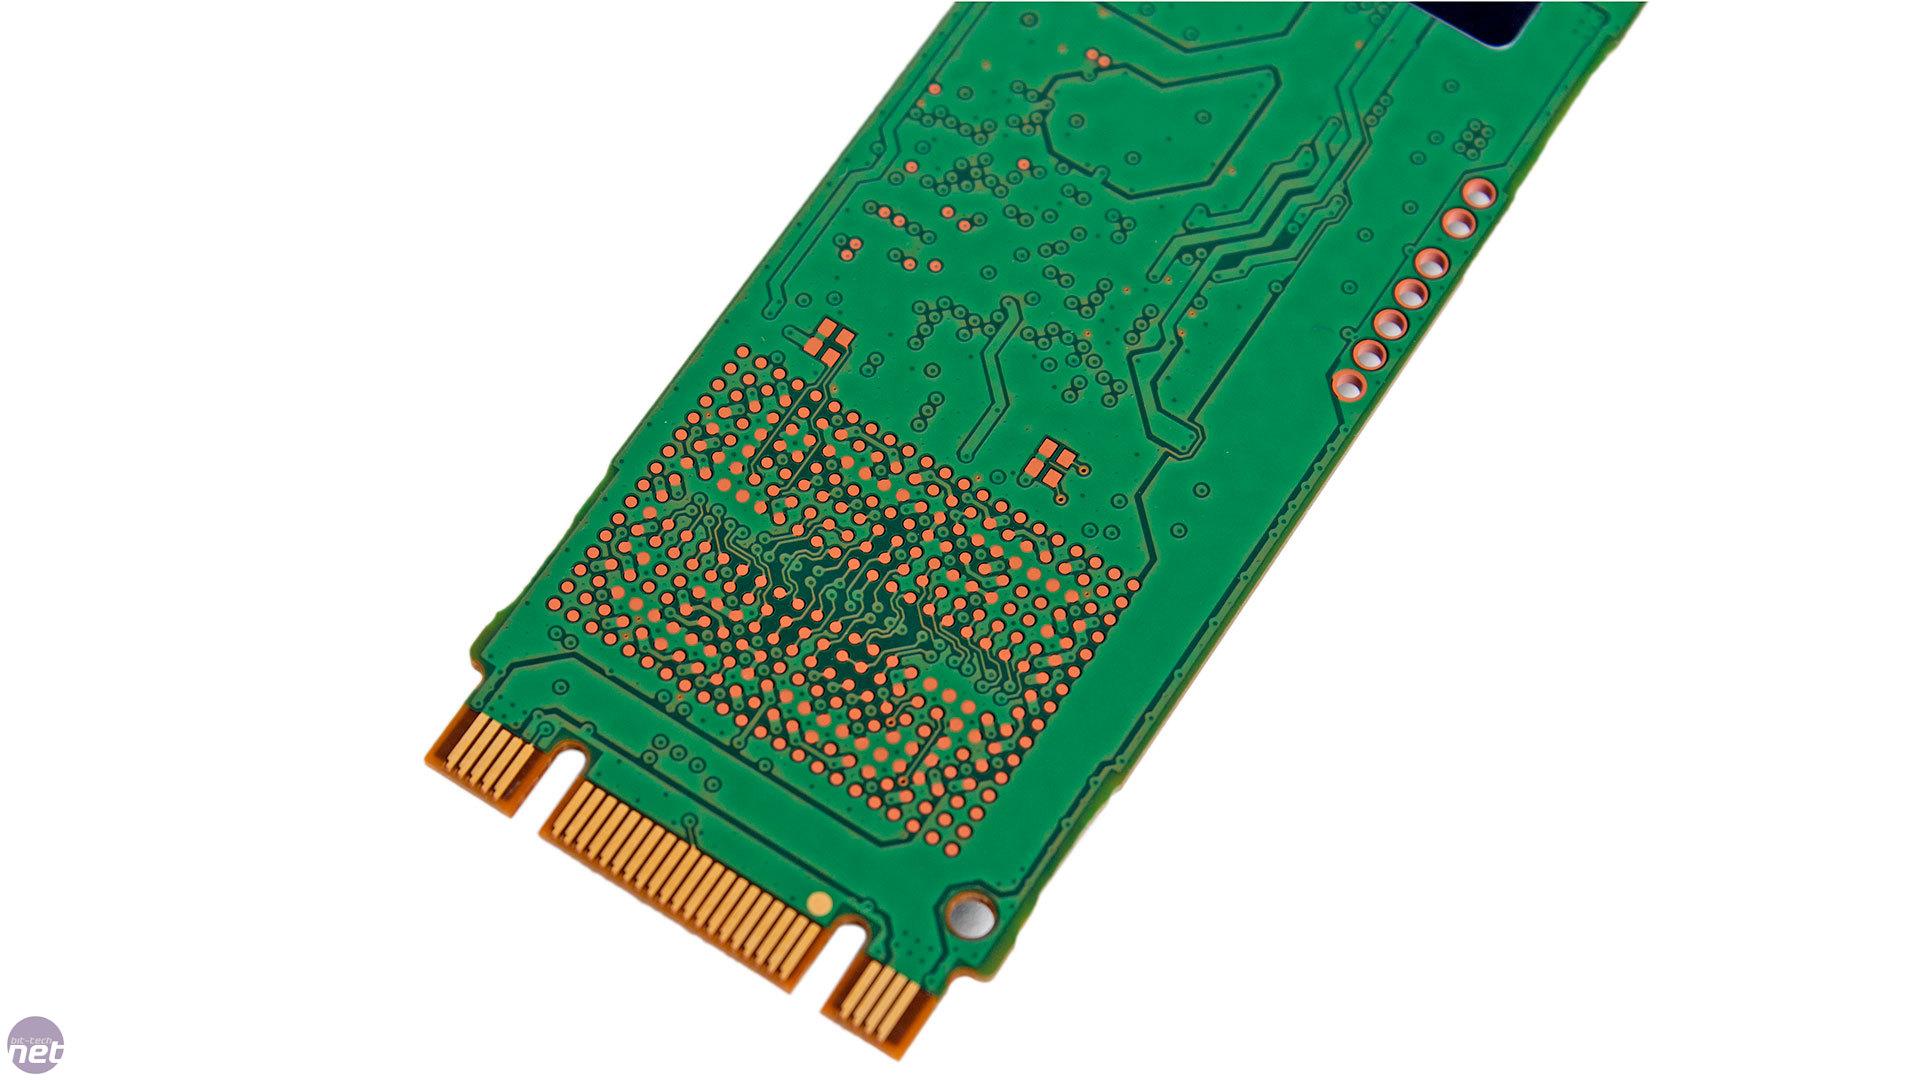 Samsung Ssd 850 Evo M2 500gb And Msata 1tb Review 250gb Nda